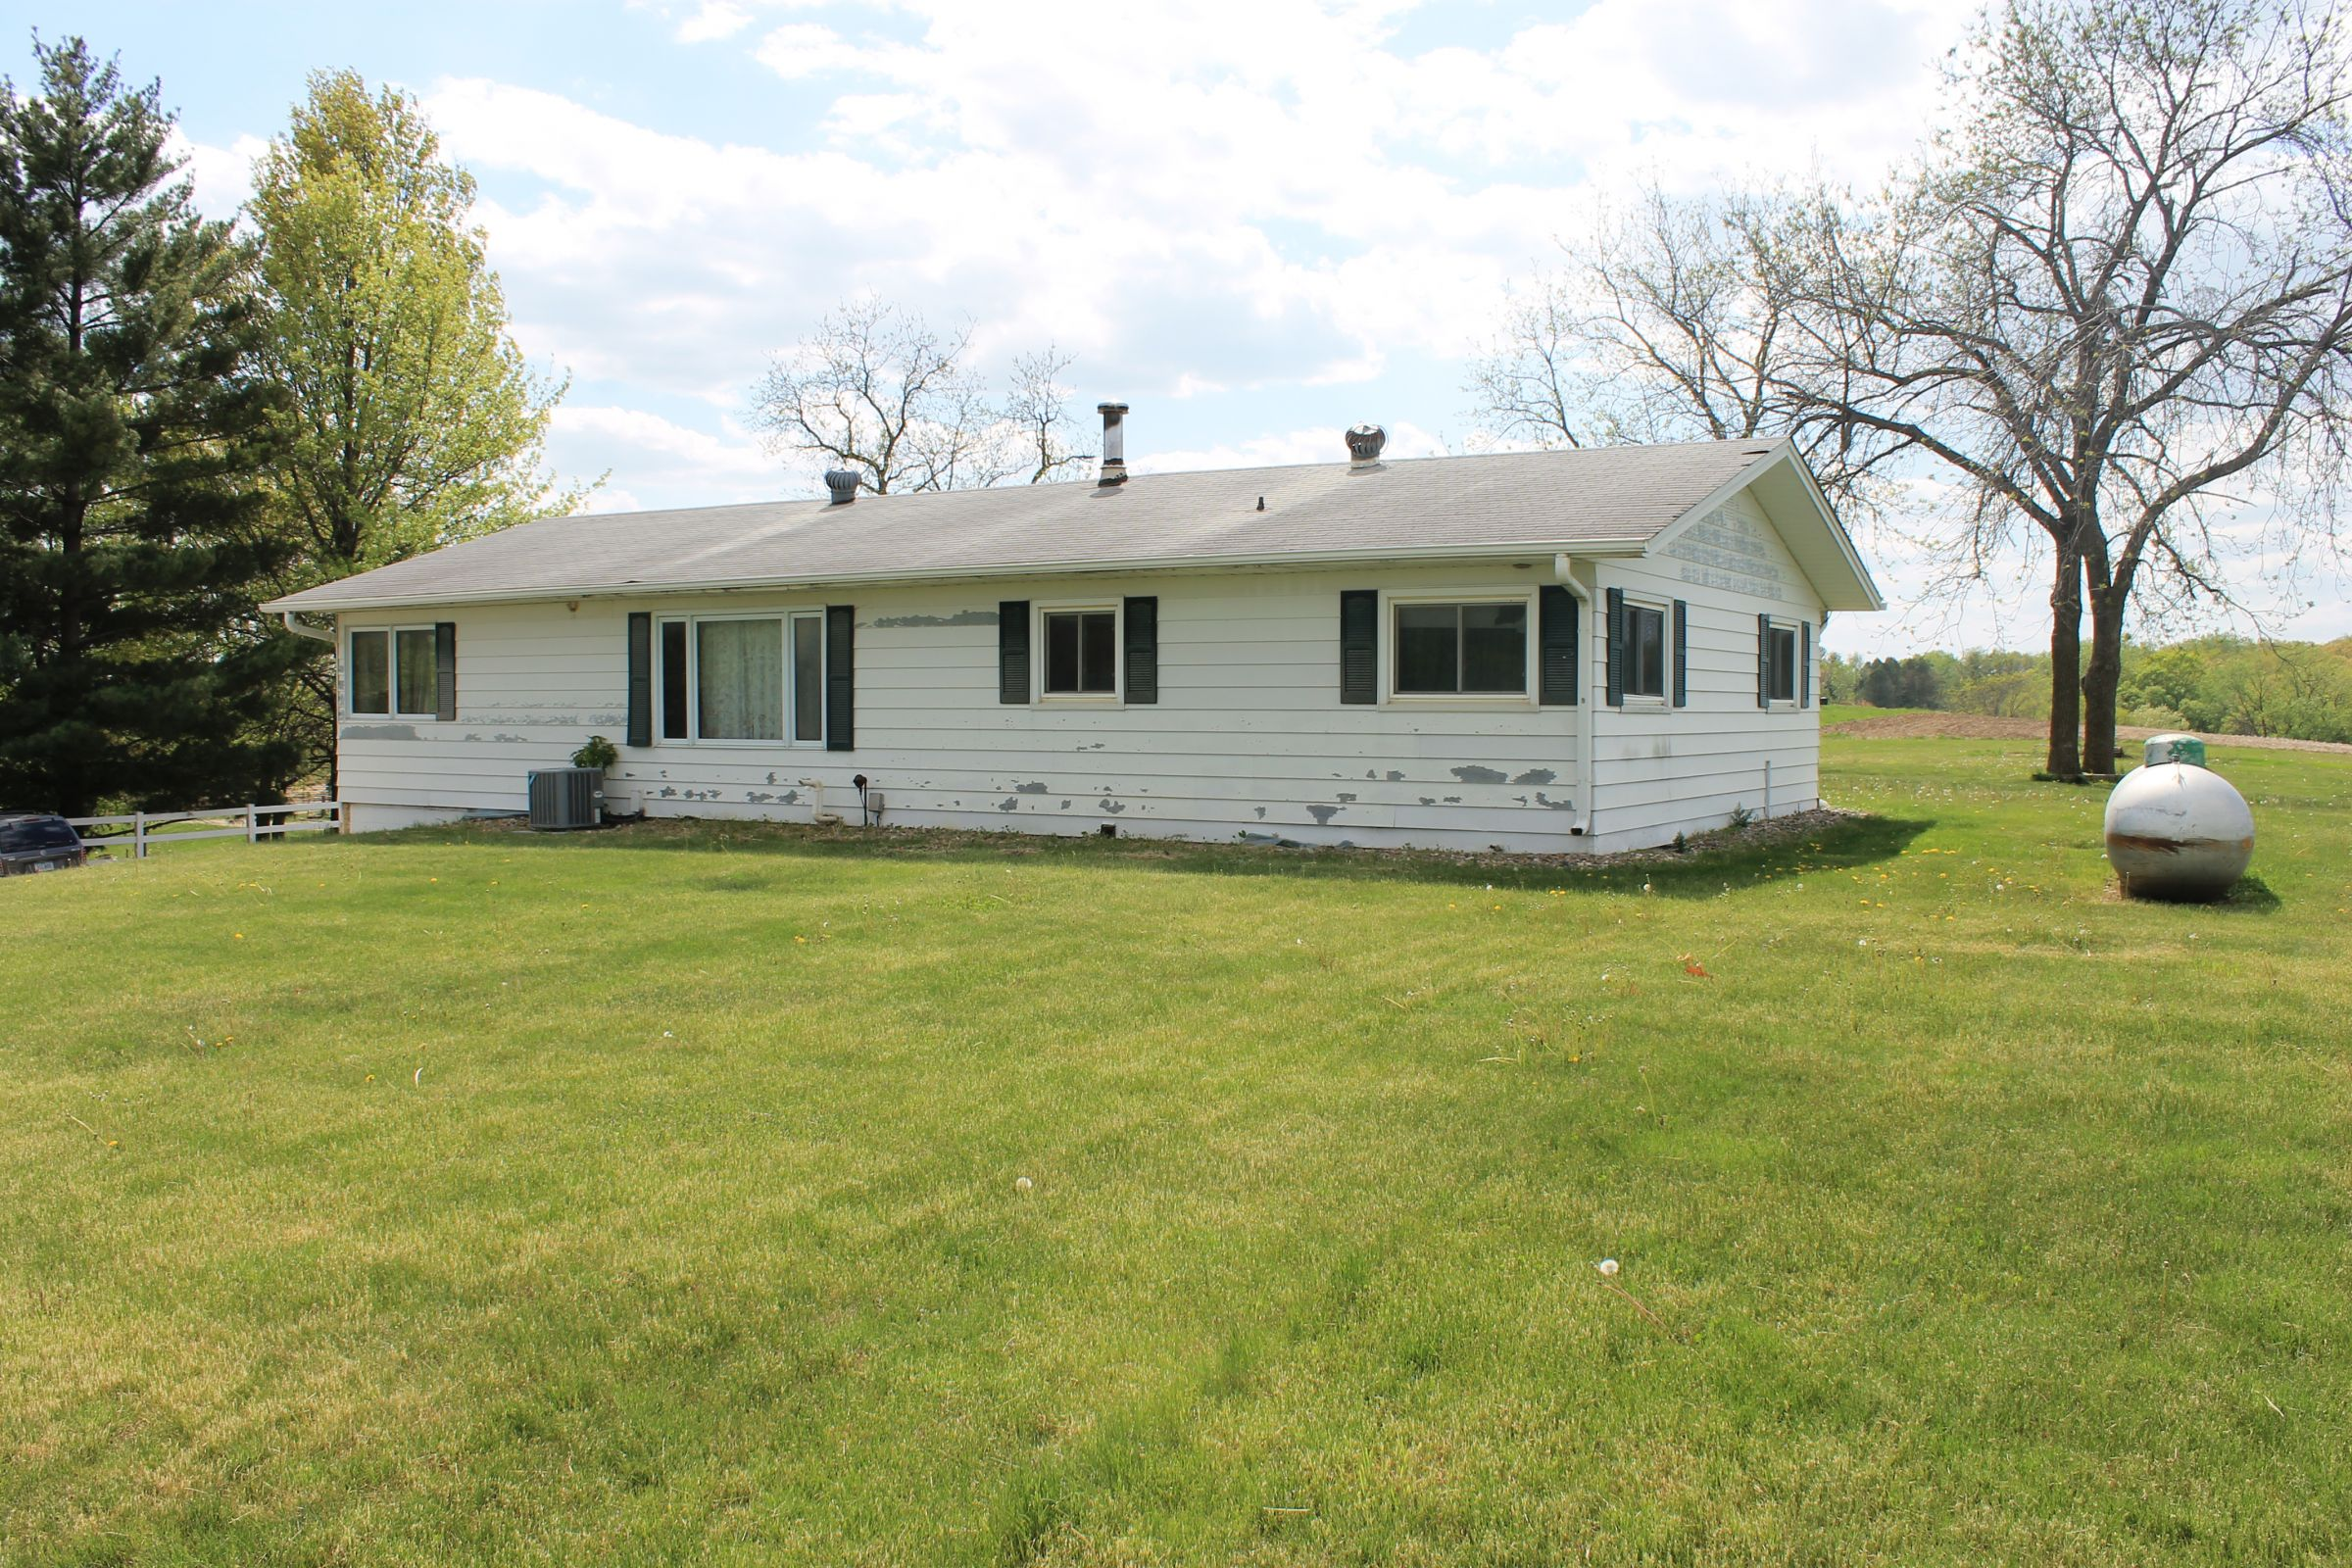 residential-development-land-warren-county-iowa-38-acres-listing-number-15513-14-2021-05-06-210447.JPG